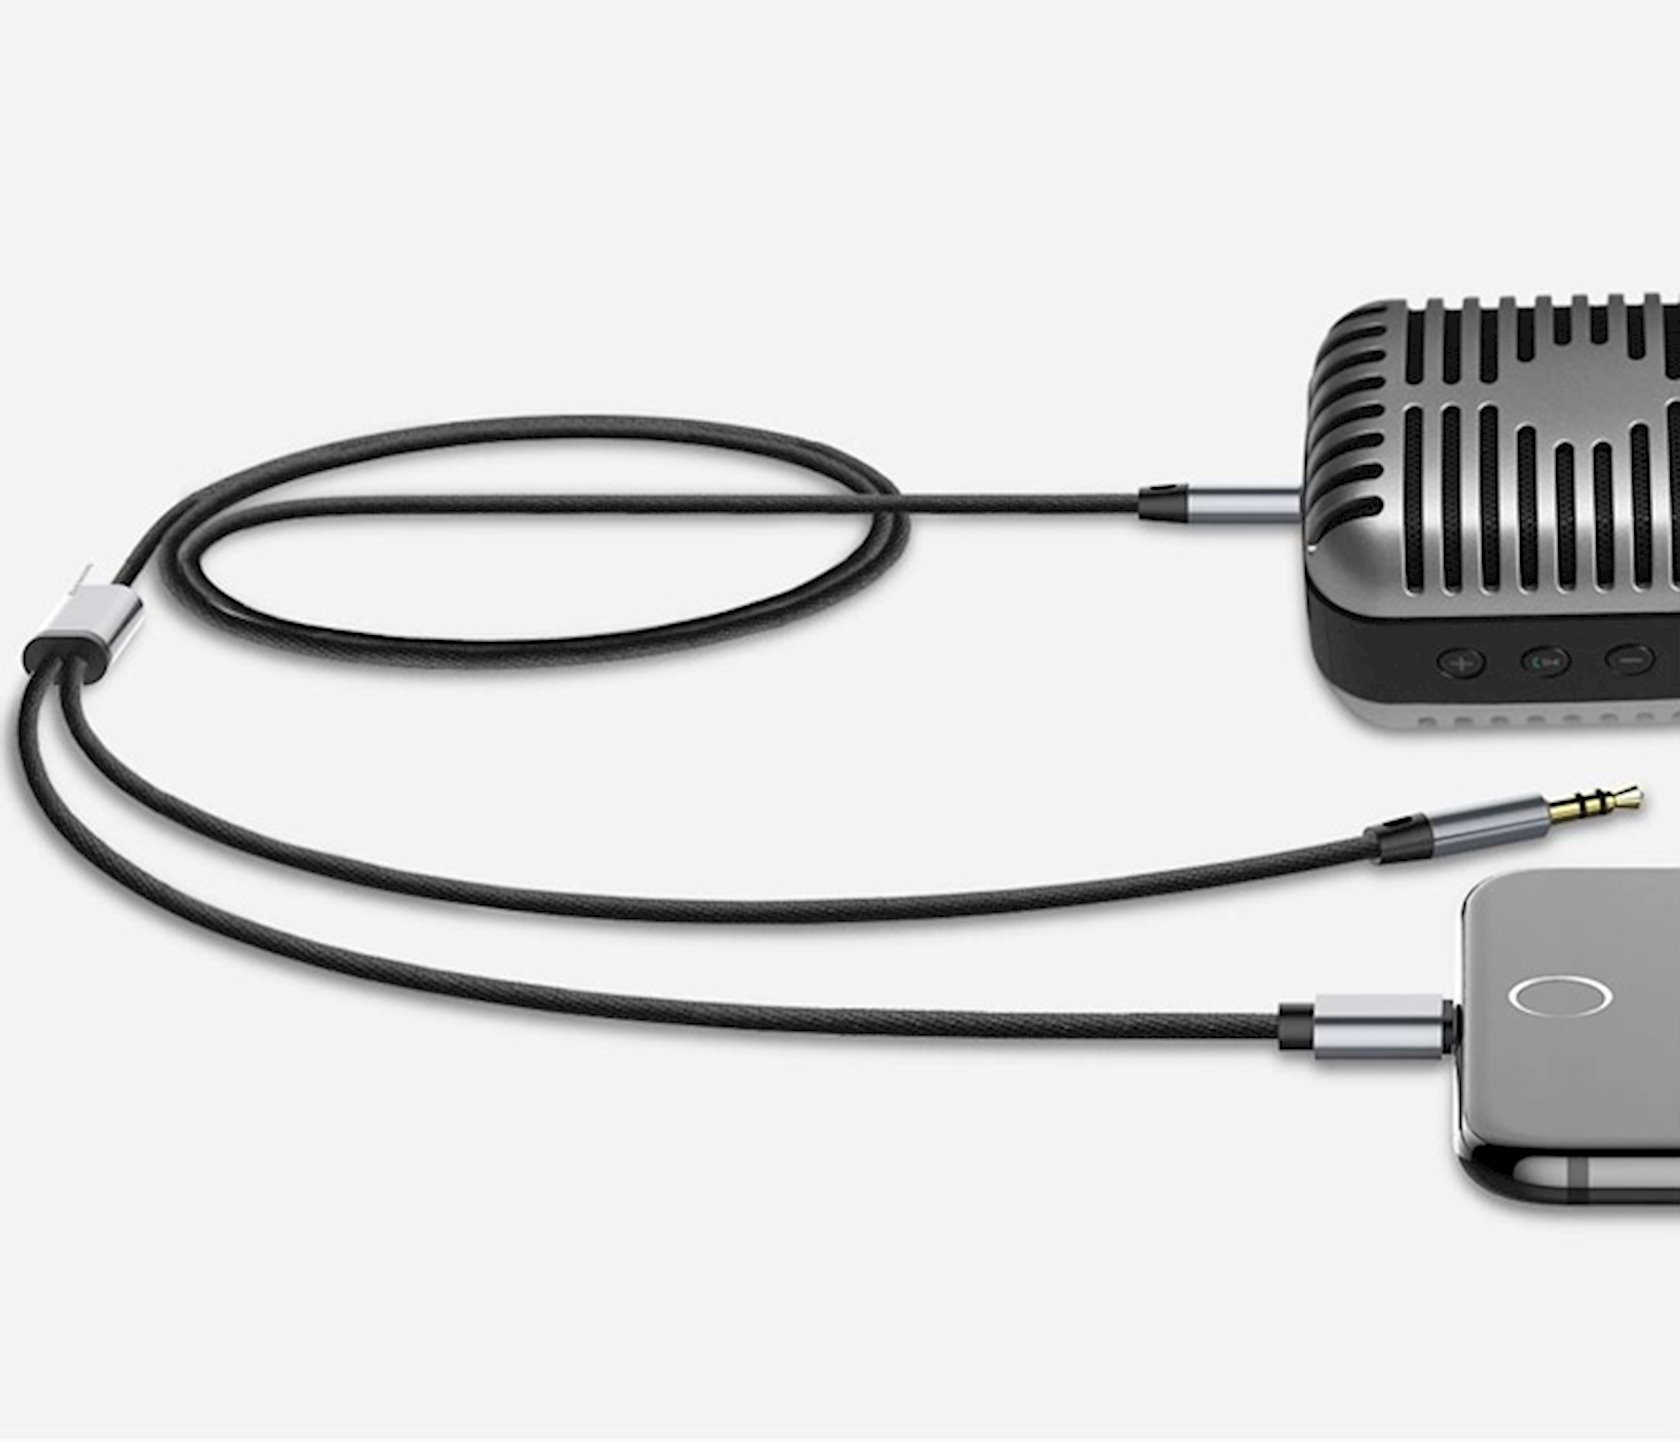 Кабель Baseus L33 apple+3.5 mm to 3.5 mm AUX audio cable Black CALL33-01